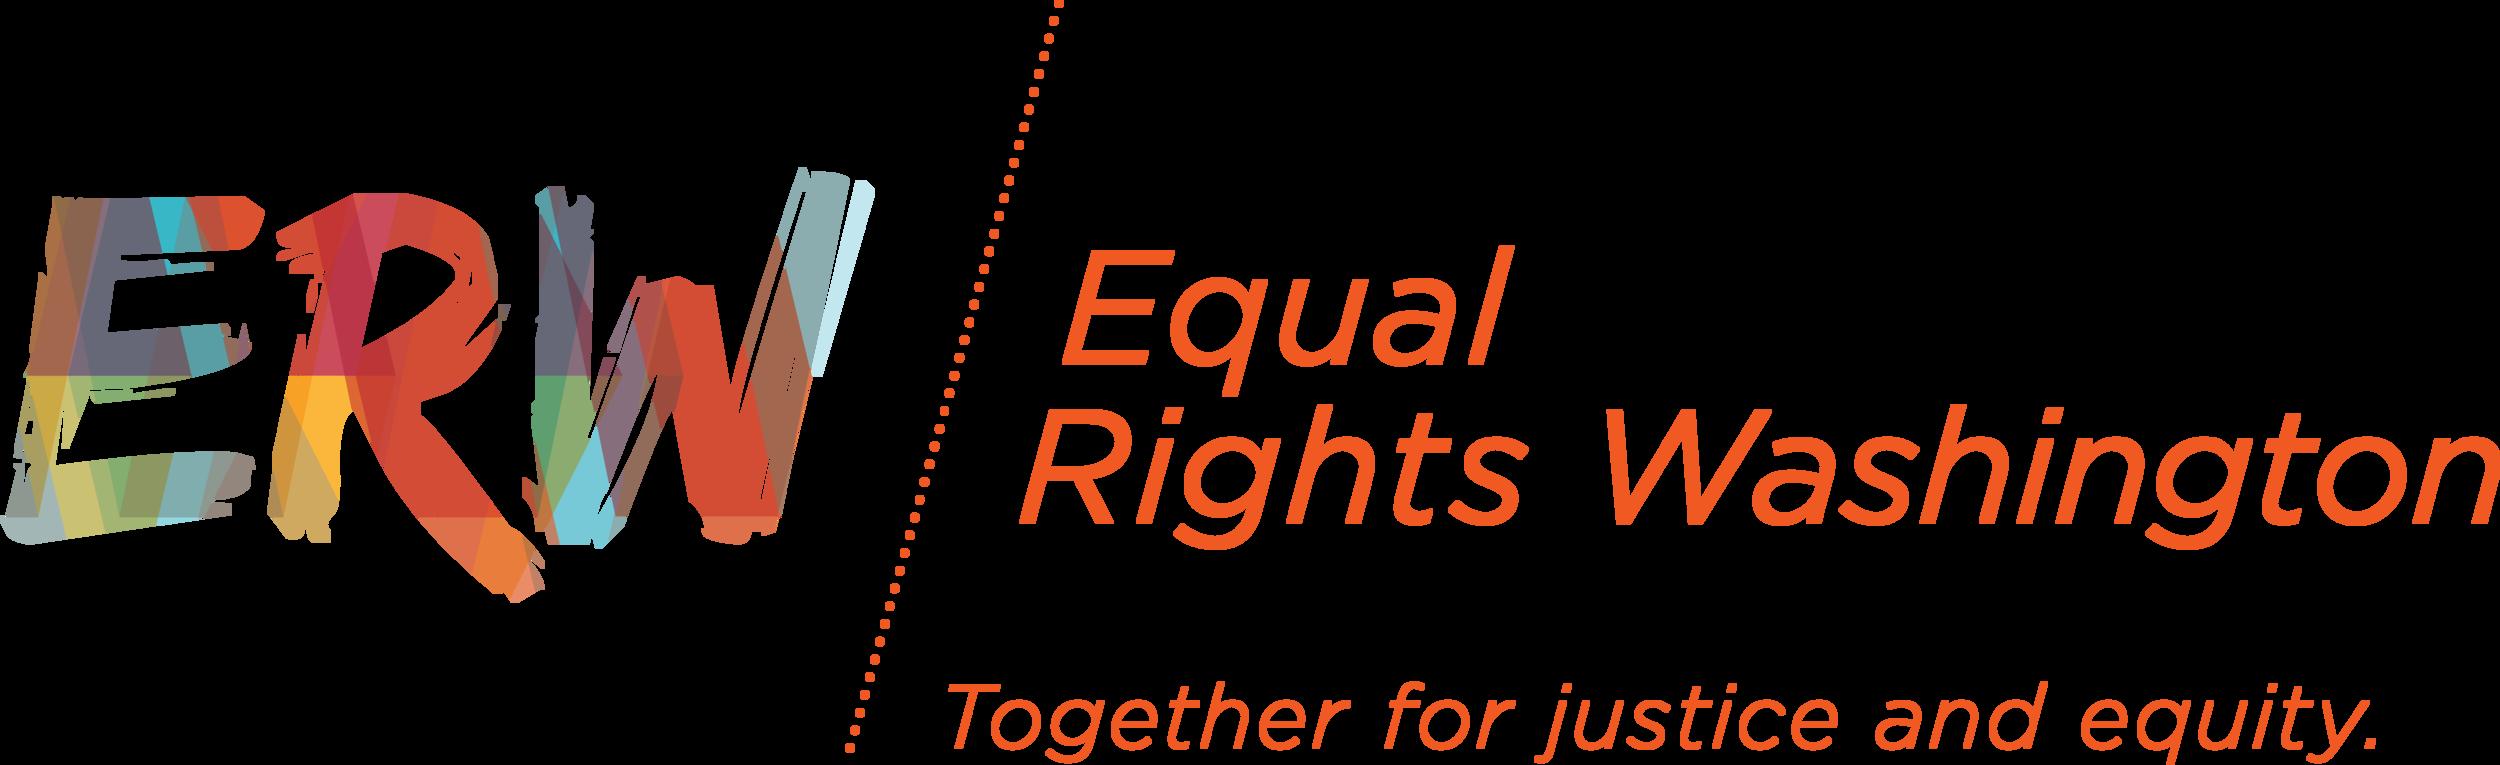 Equal Rights Washington